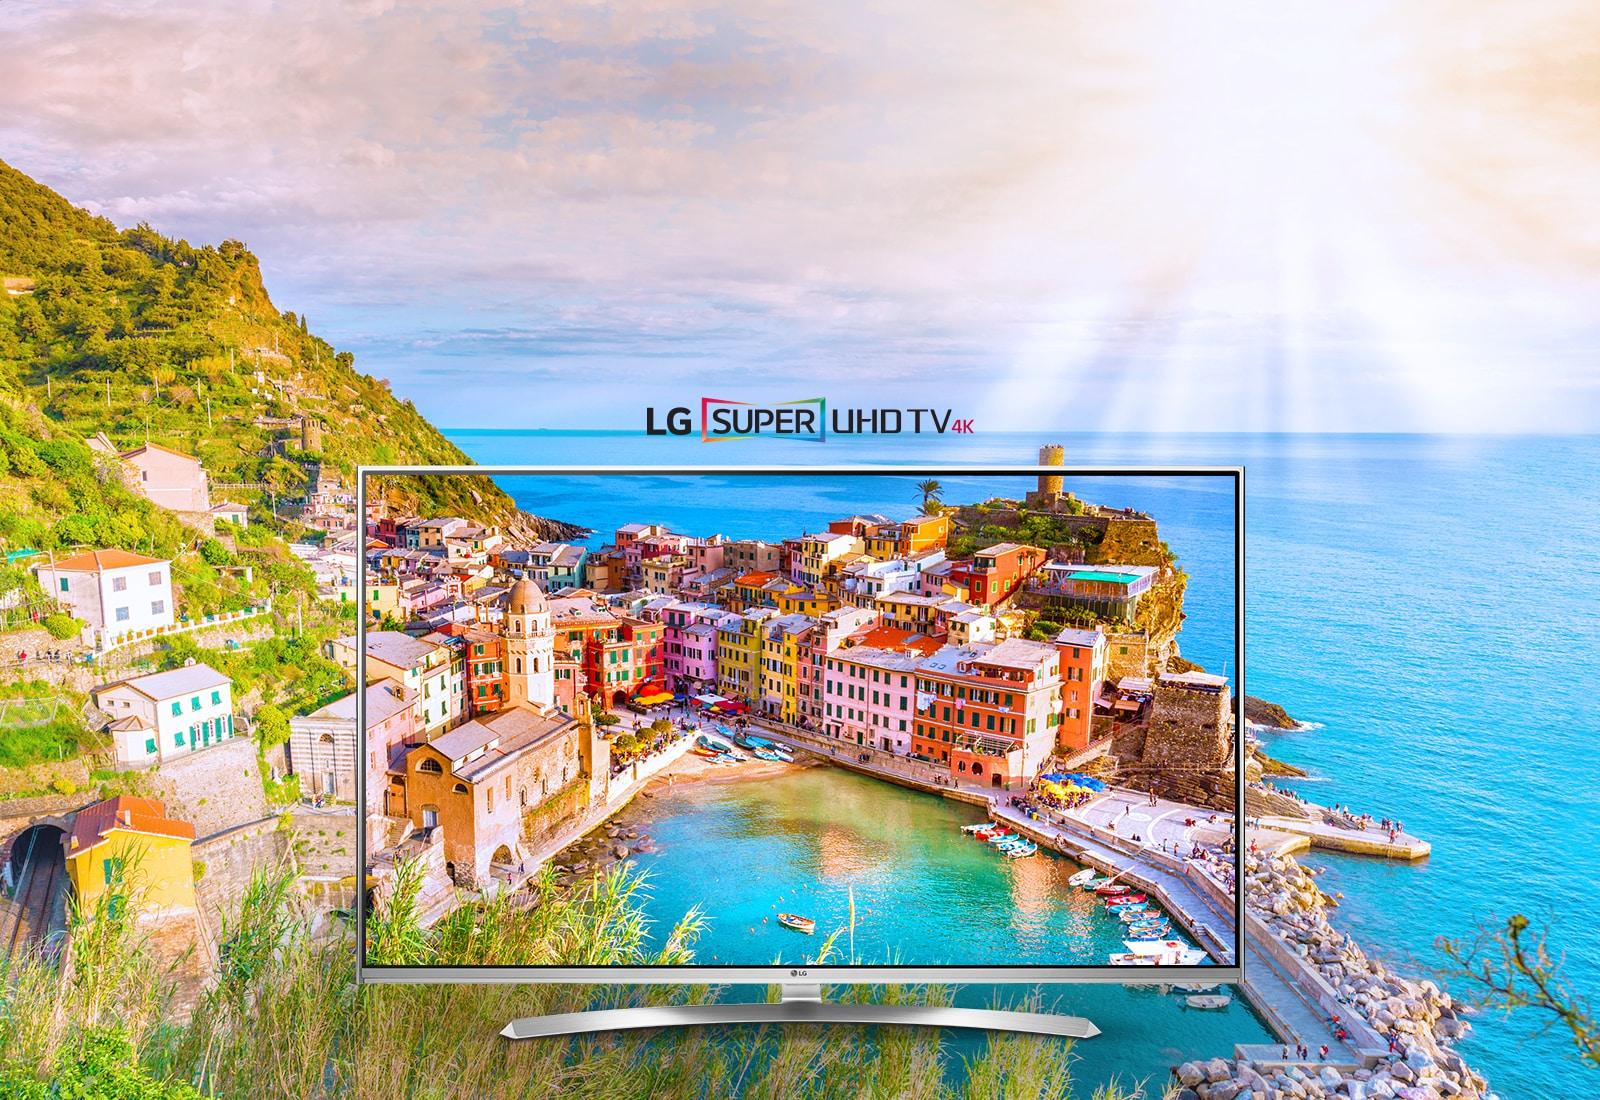 Televisor LG SUPER UHD 4K